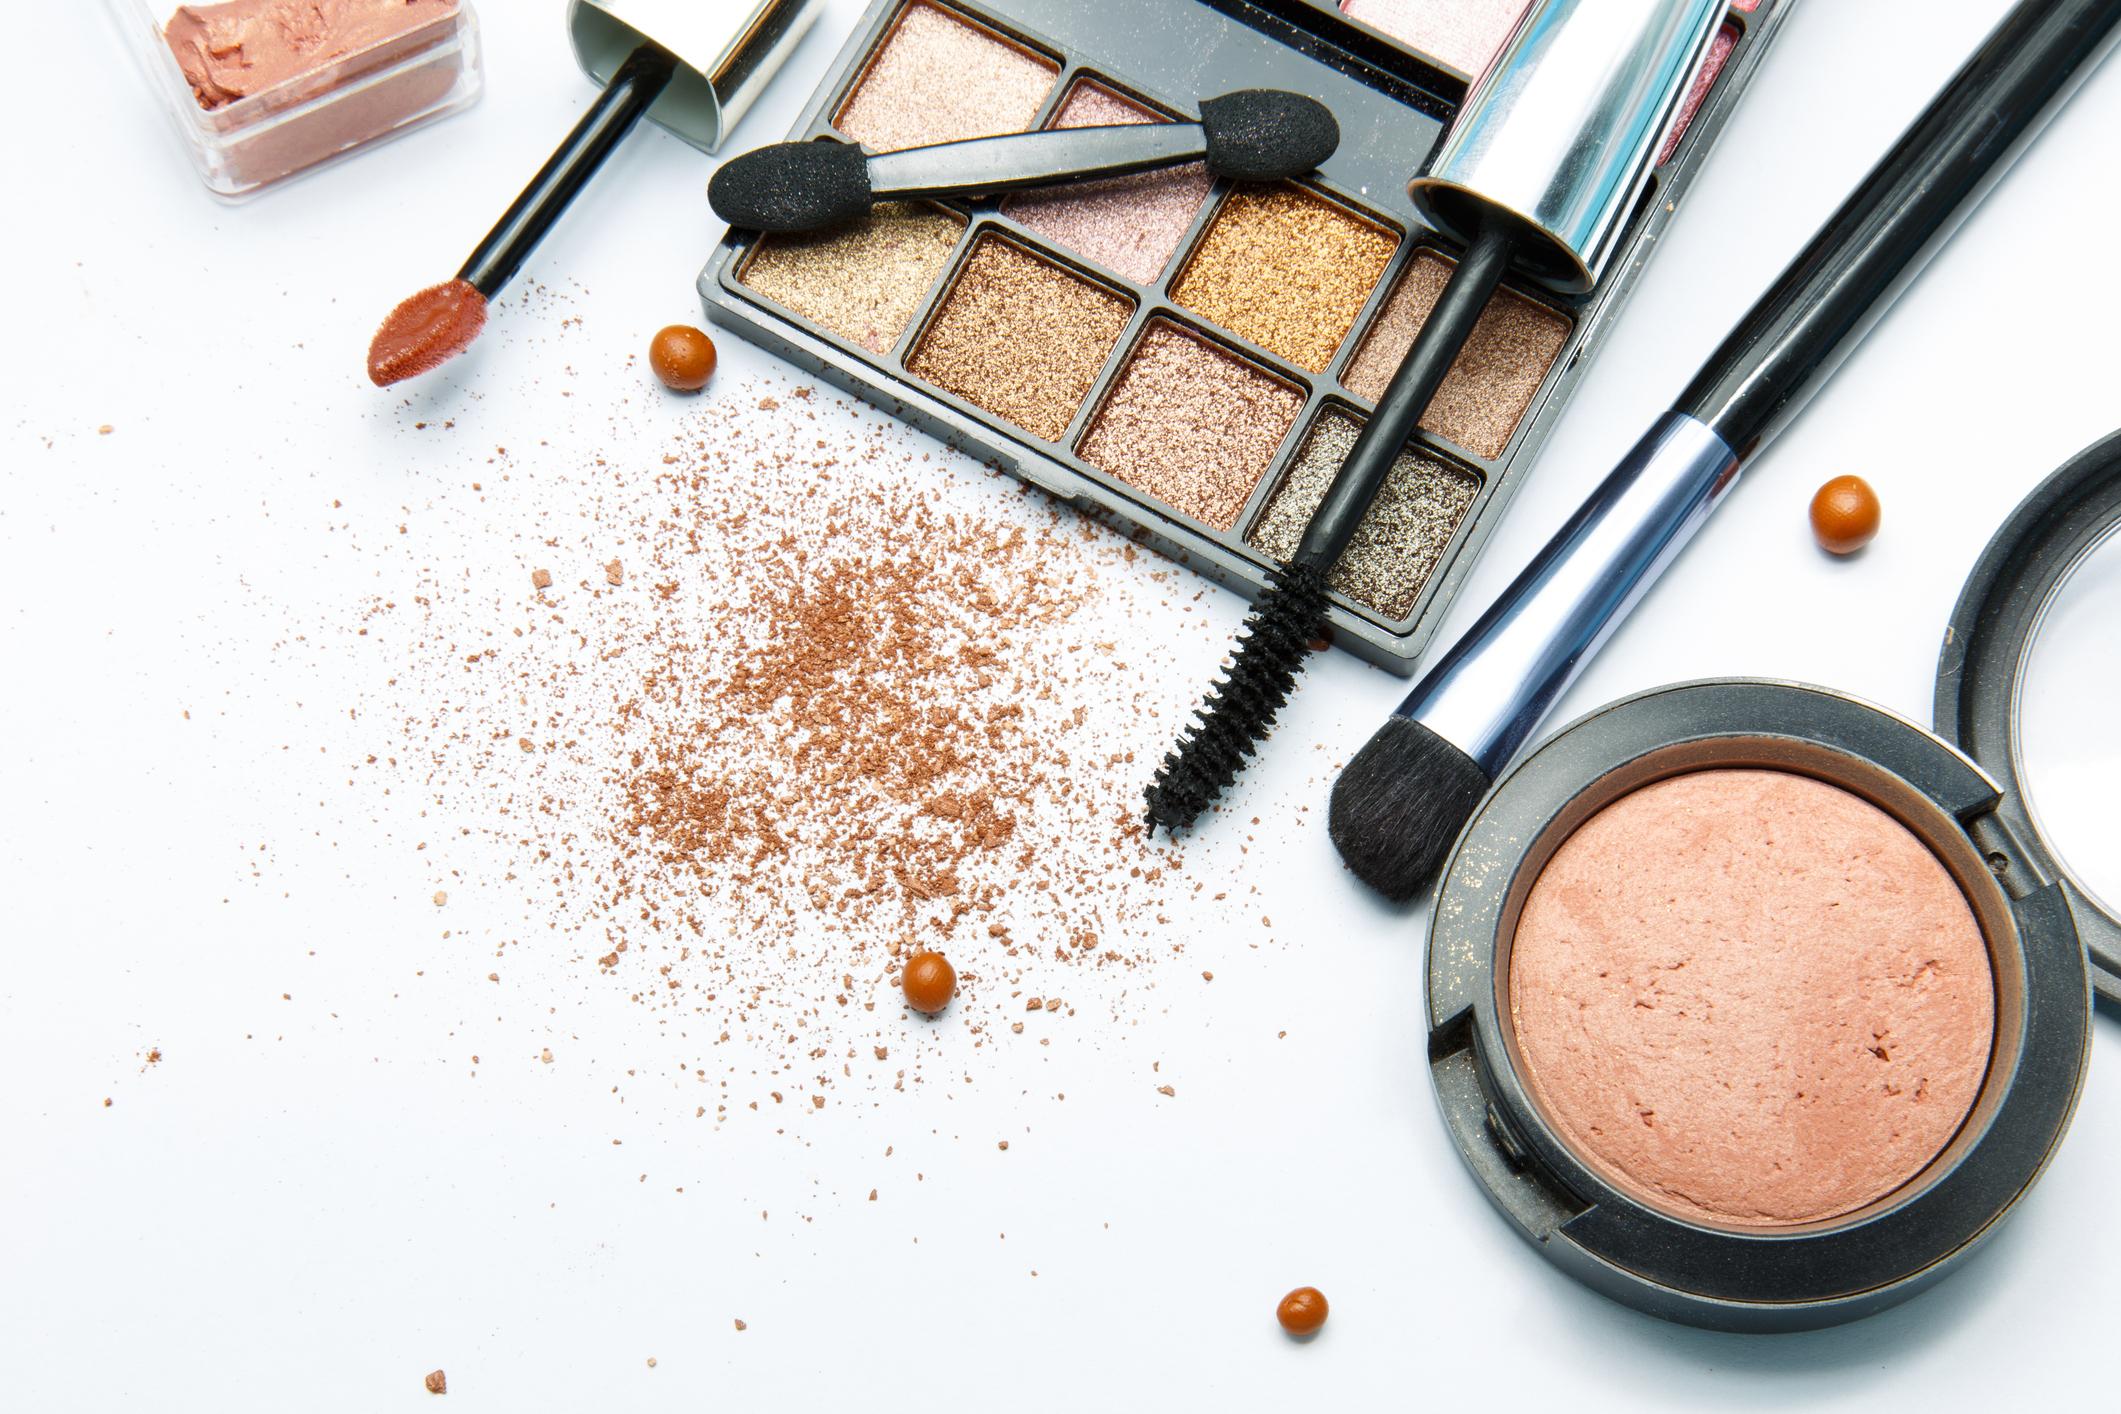 Image shows an assortment of open makeup.